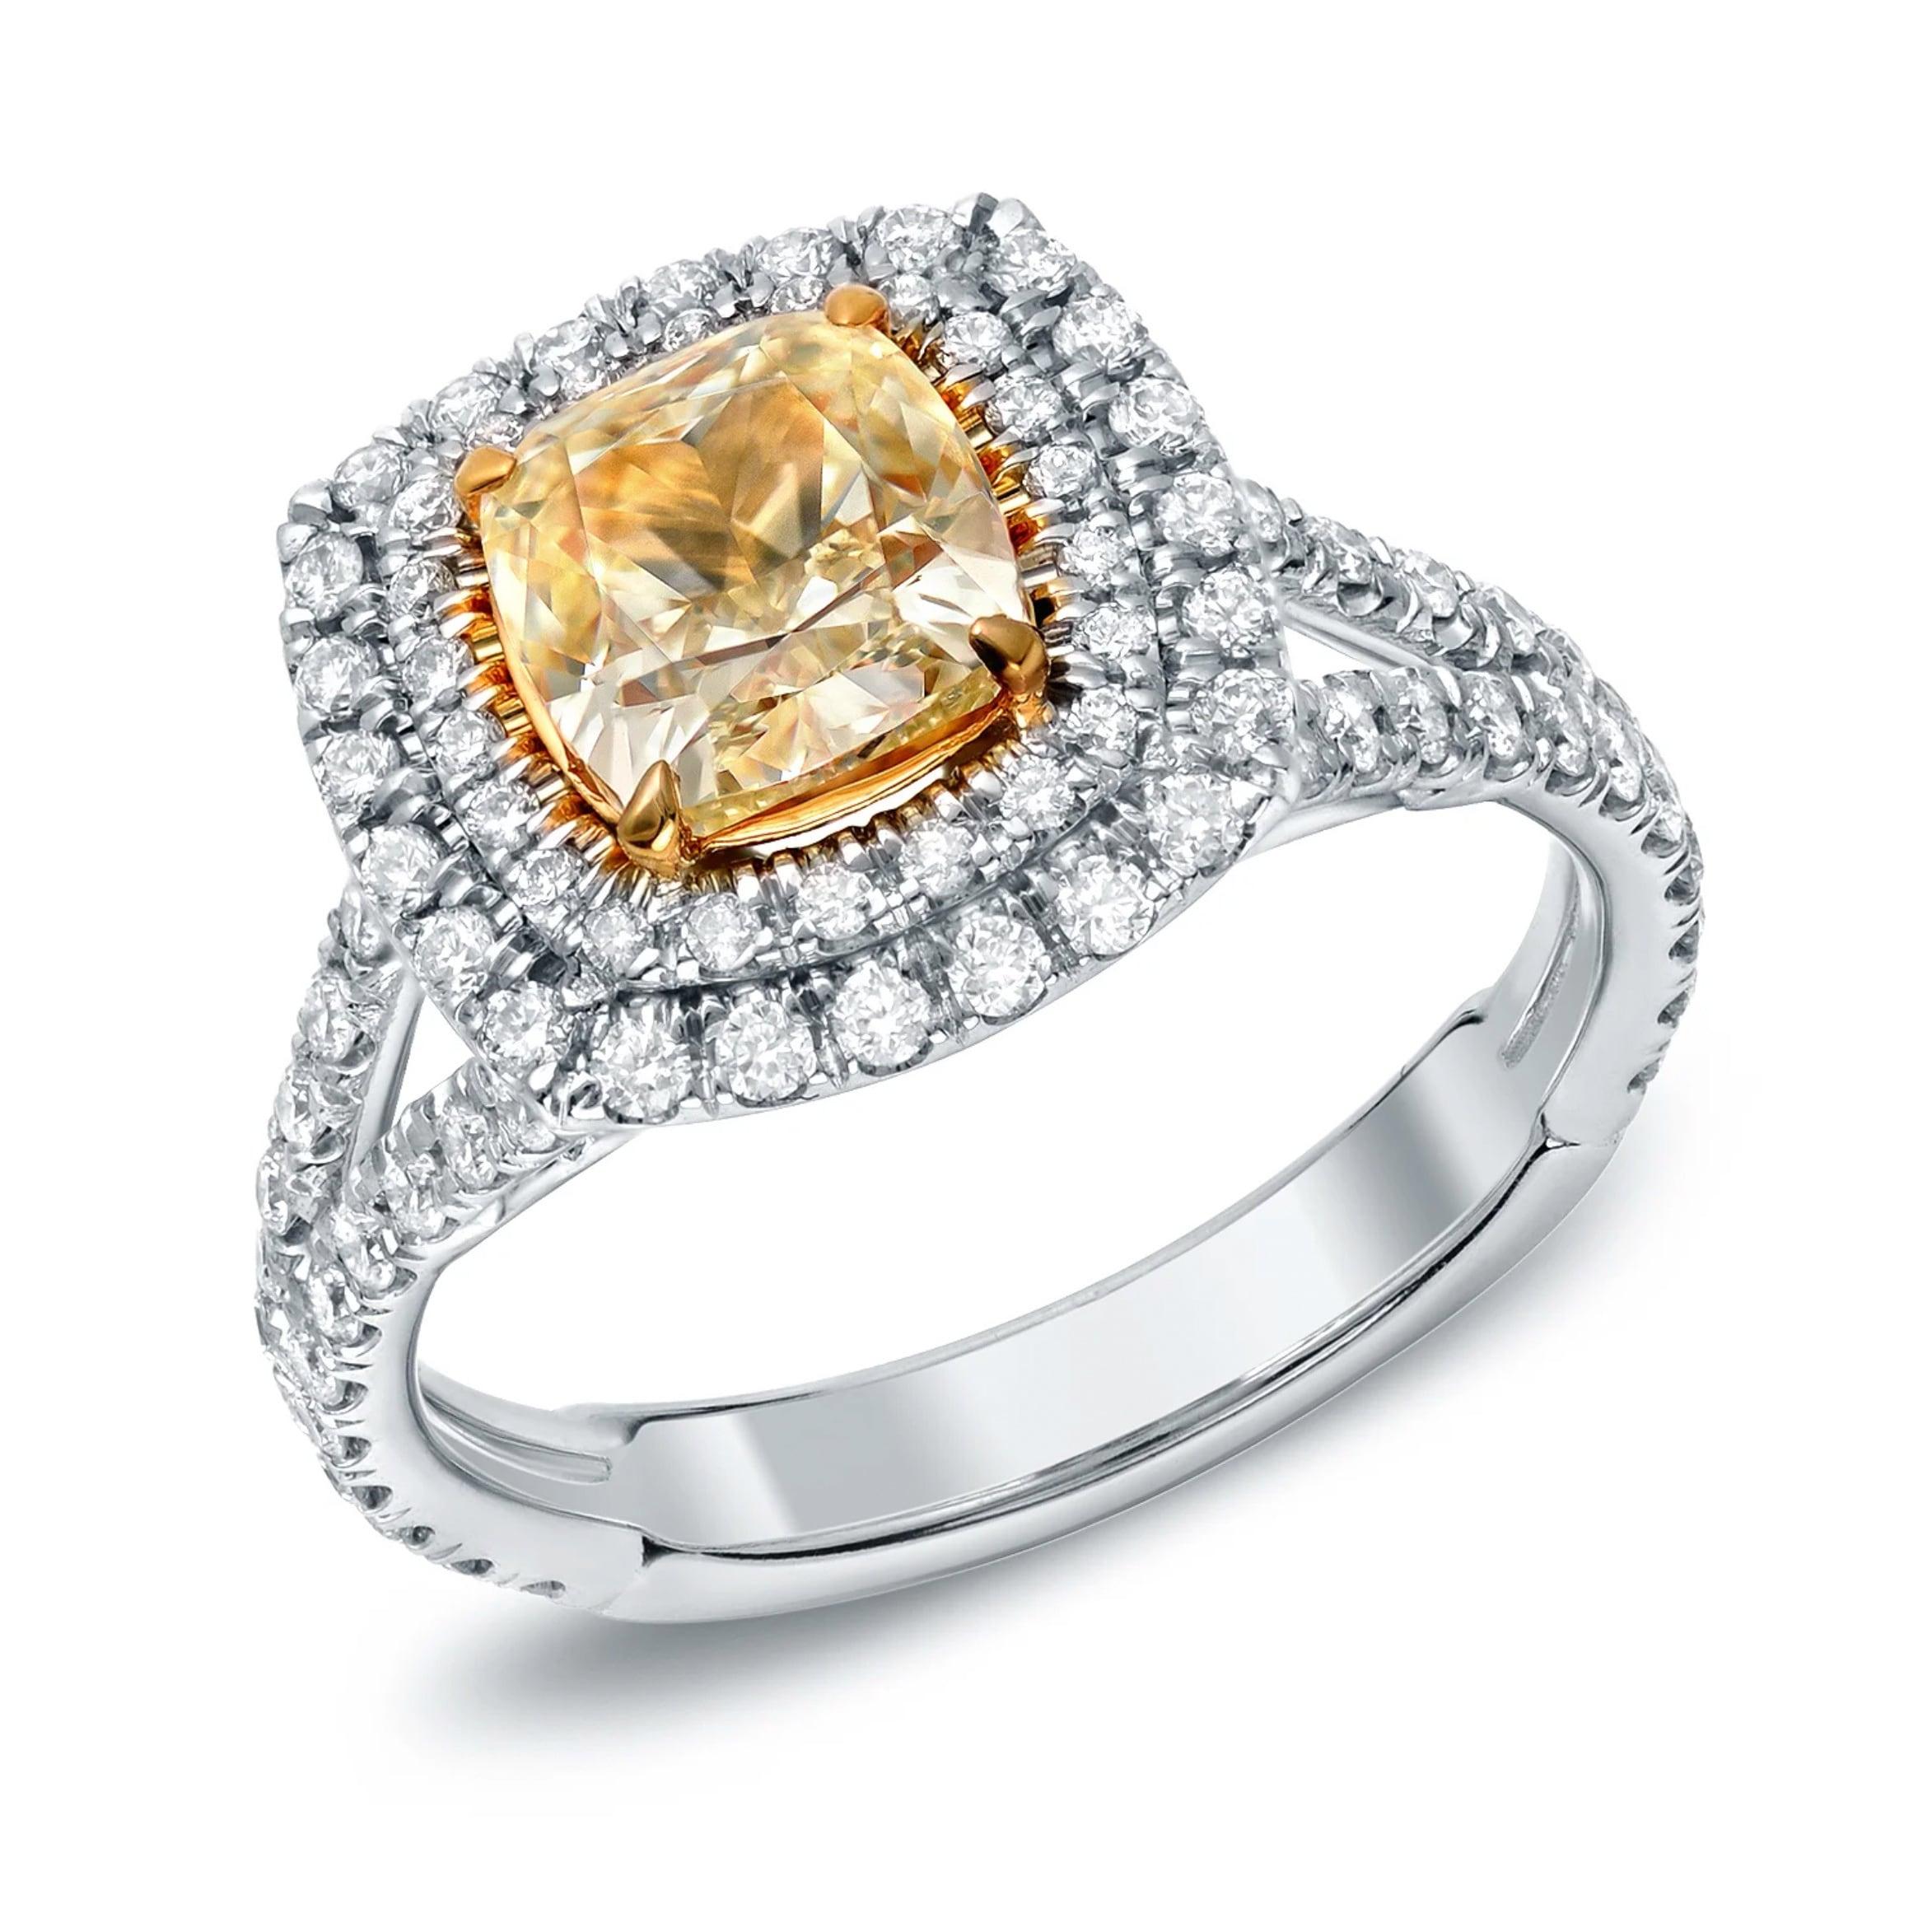 Auriya 2 1 2ct Tdw Cushion Cut Fancy Yellow Diamond Halo Engagement Ring 18k Gold Certified